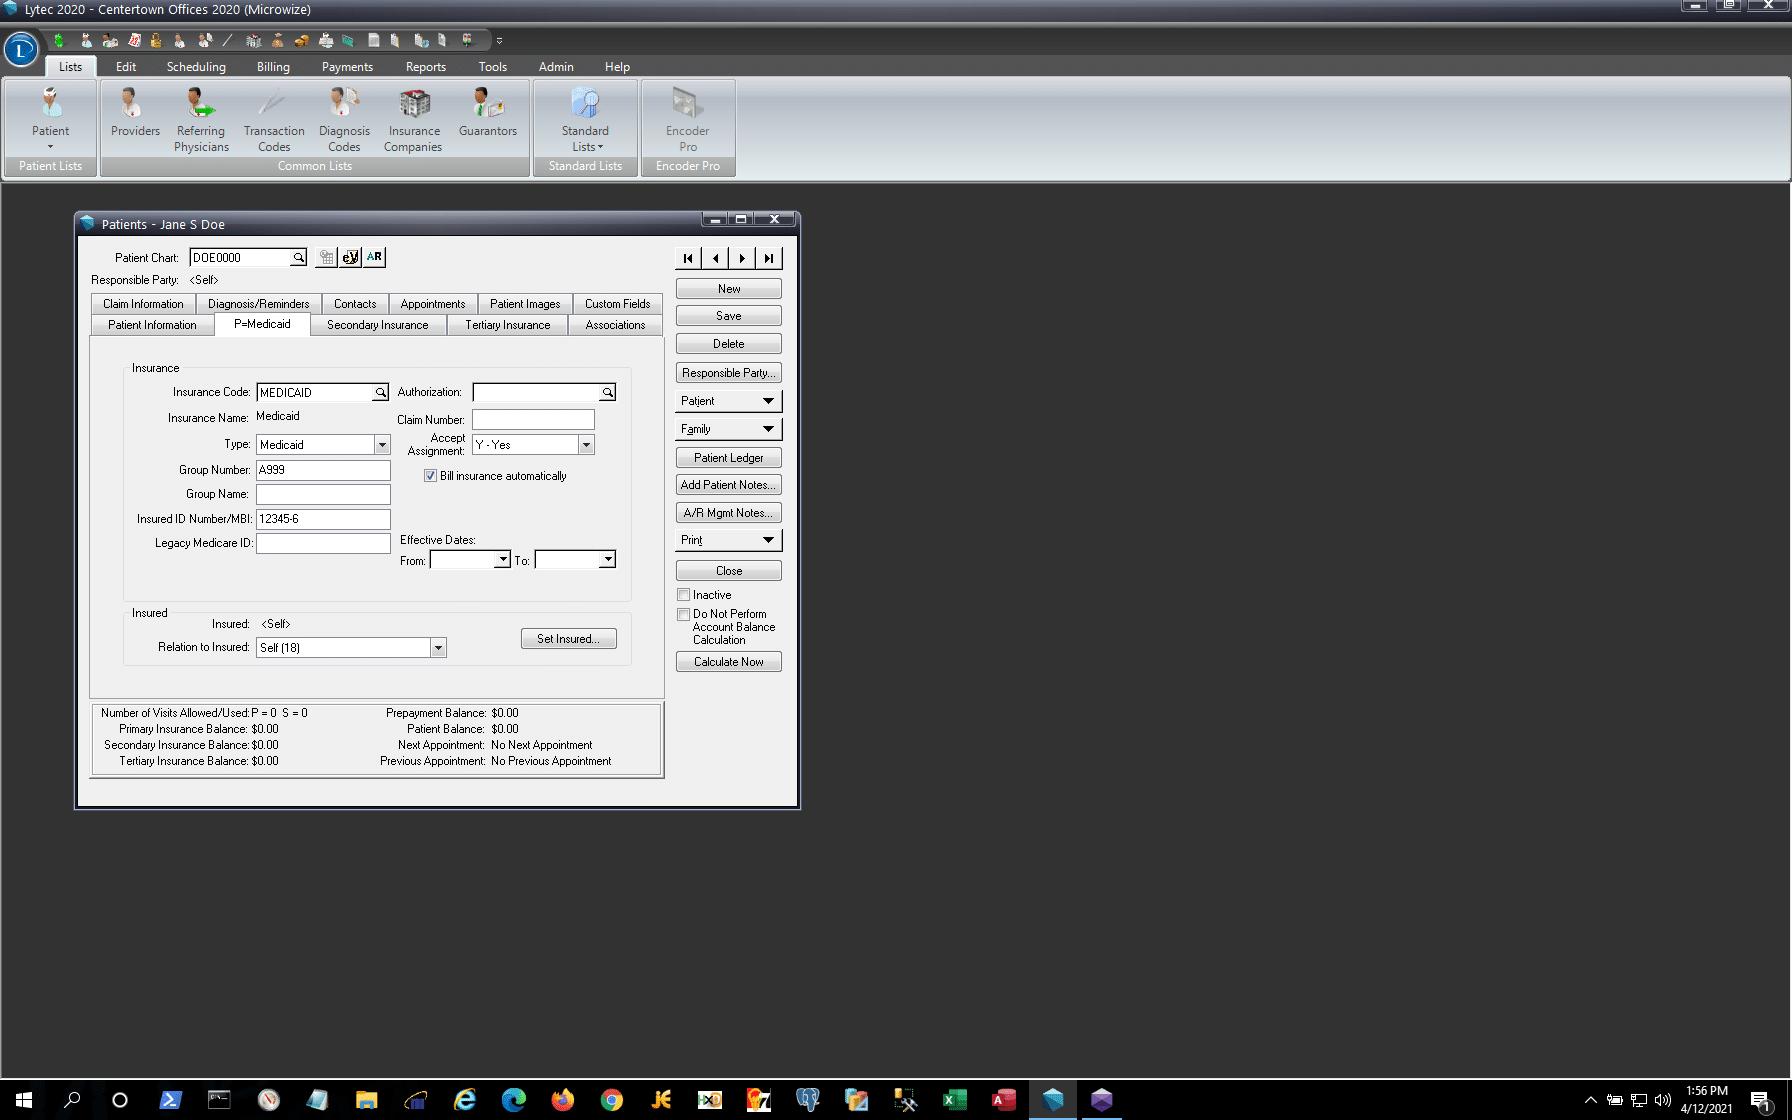 Lytec Patient Demo- Screenshot 2